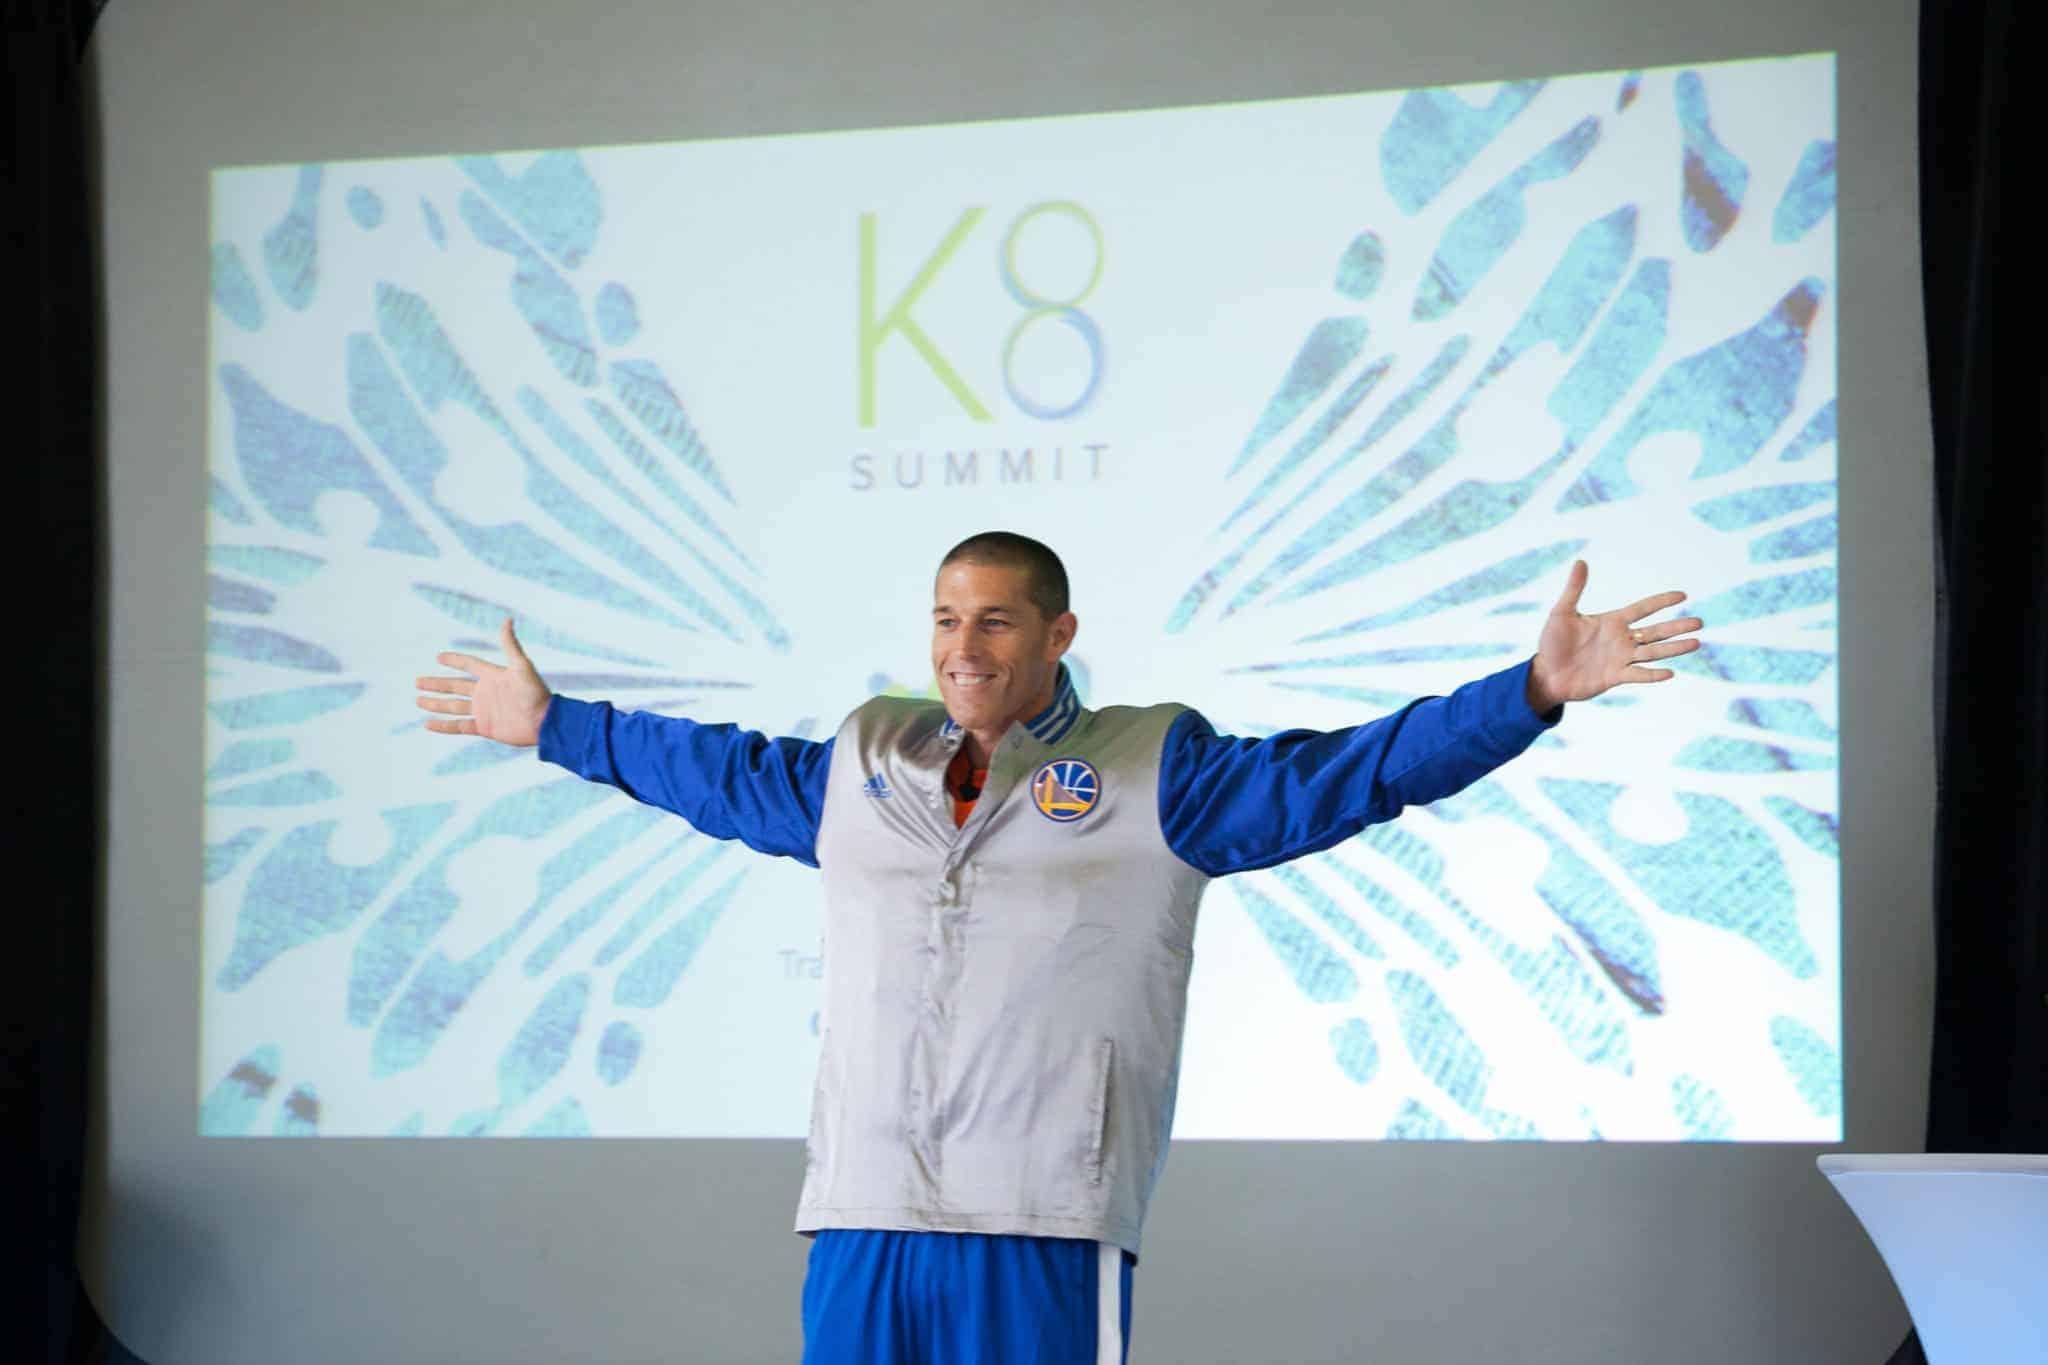 046-Kenshoo-K8-2015-7659-sm